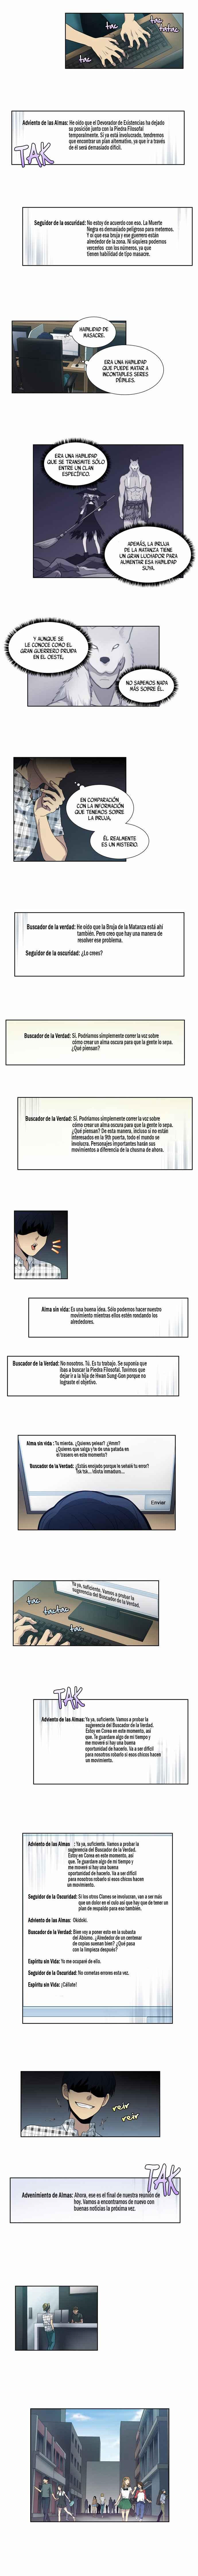 https://c5.ninemanga.com/es_manga/61/1725/364501/3d1694baba5418571bd3ba780d667ec6.jpg Page 5